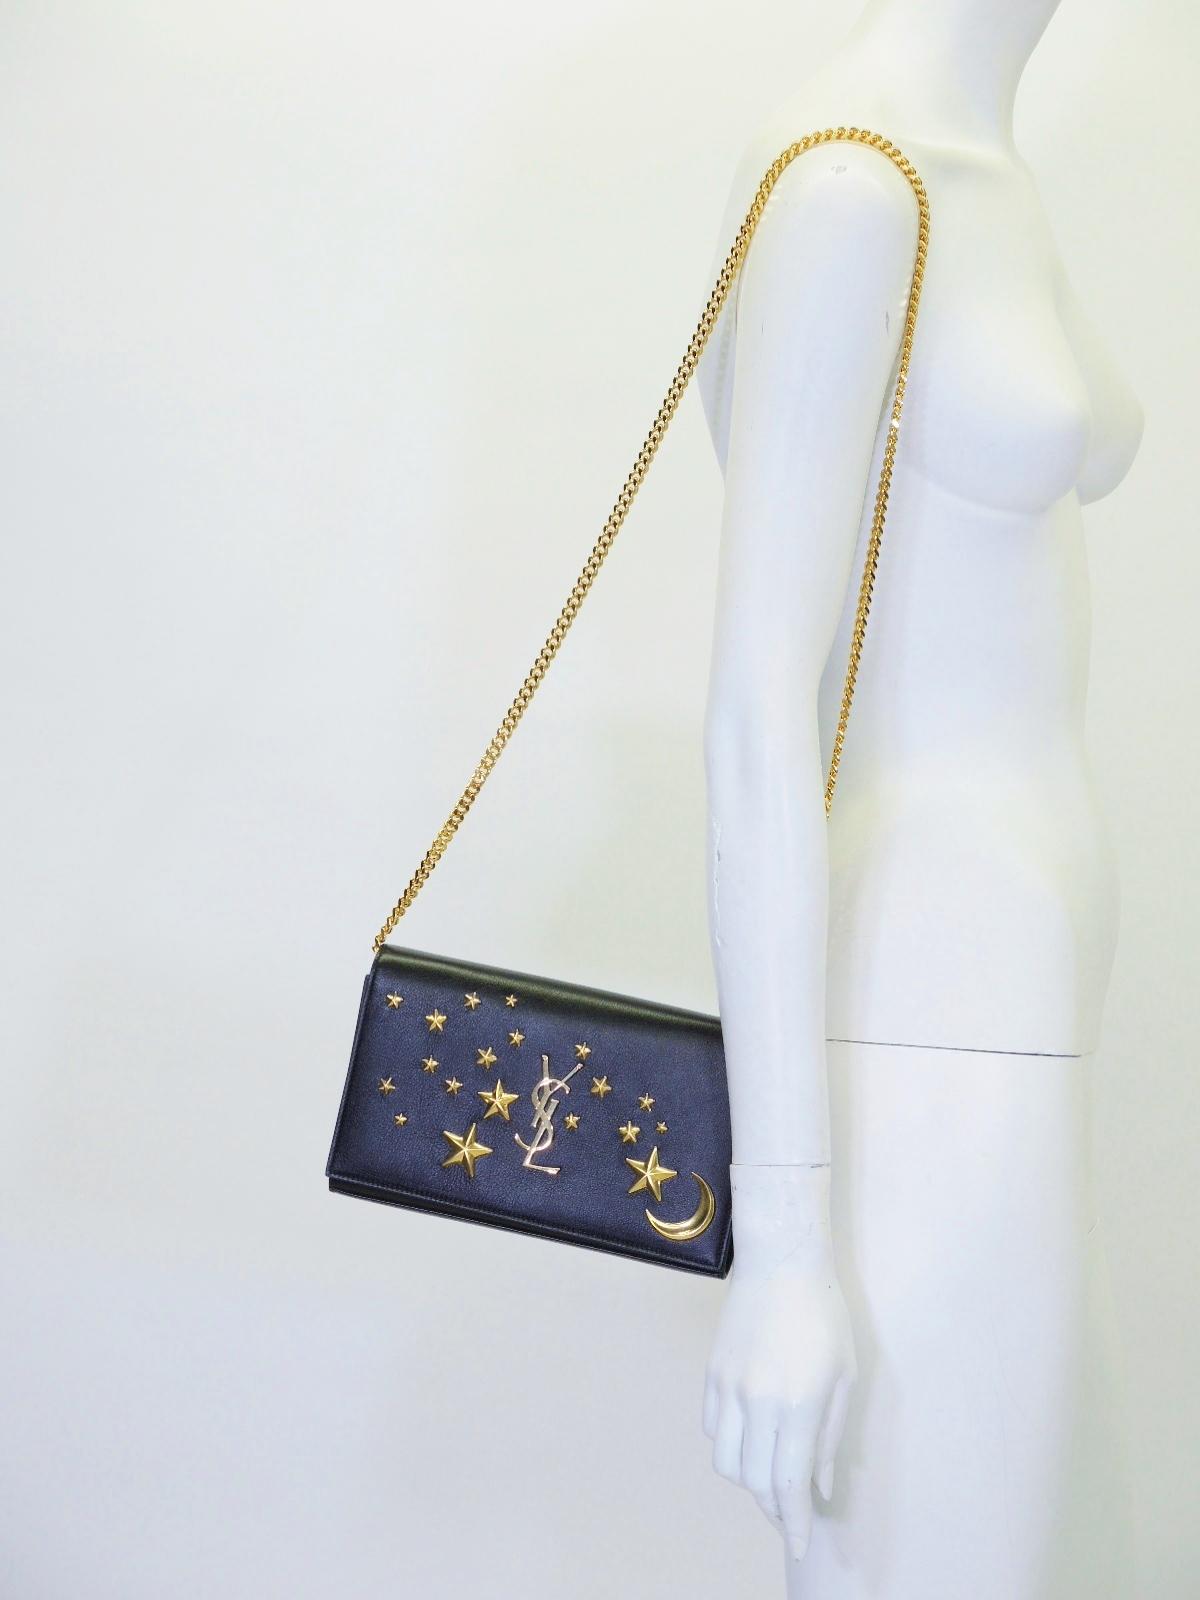 Luggage & Bags Just Cute Girl Crossbody Bag Cartoon Moon Star Handbag Shinny Glitter Star Crossbody Purse Wallet Stars Handbag Price Remains Stable